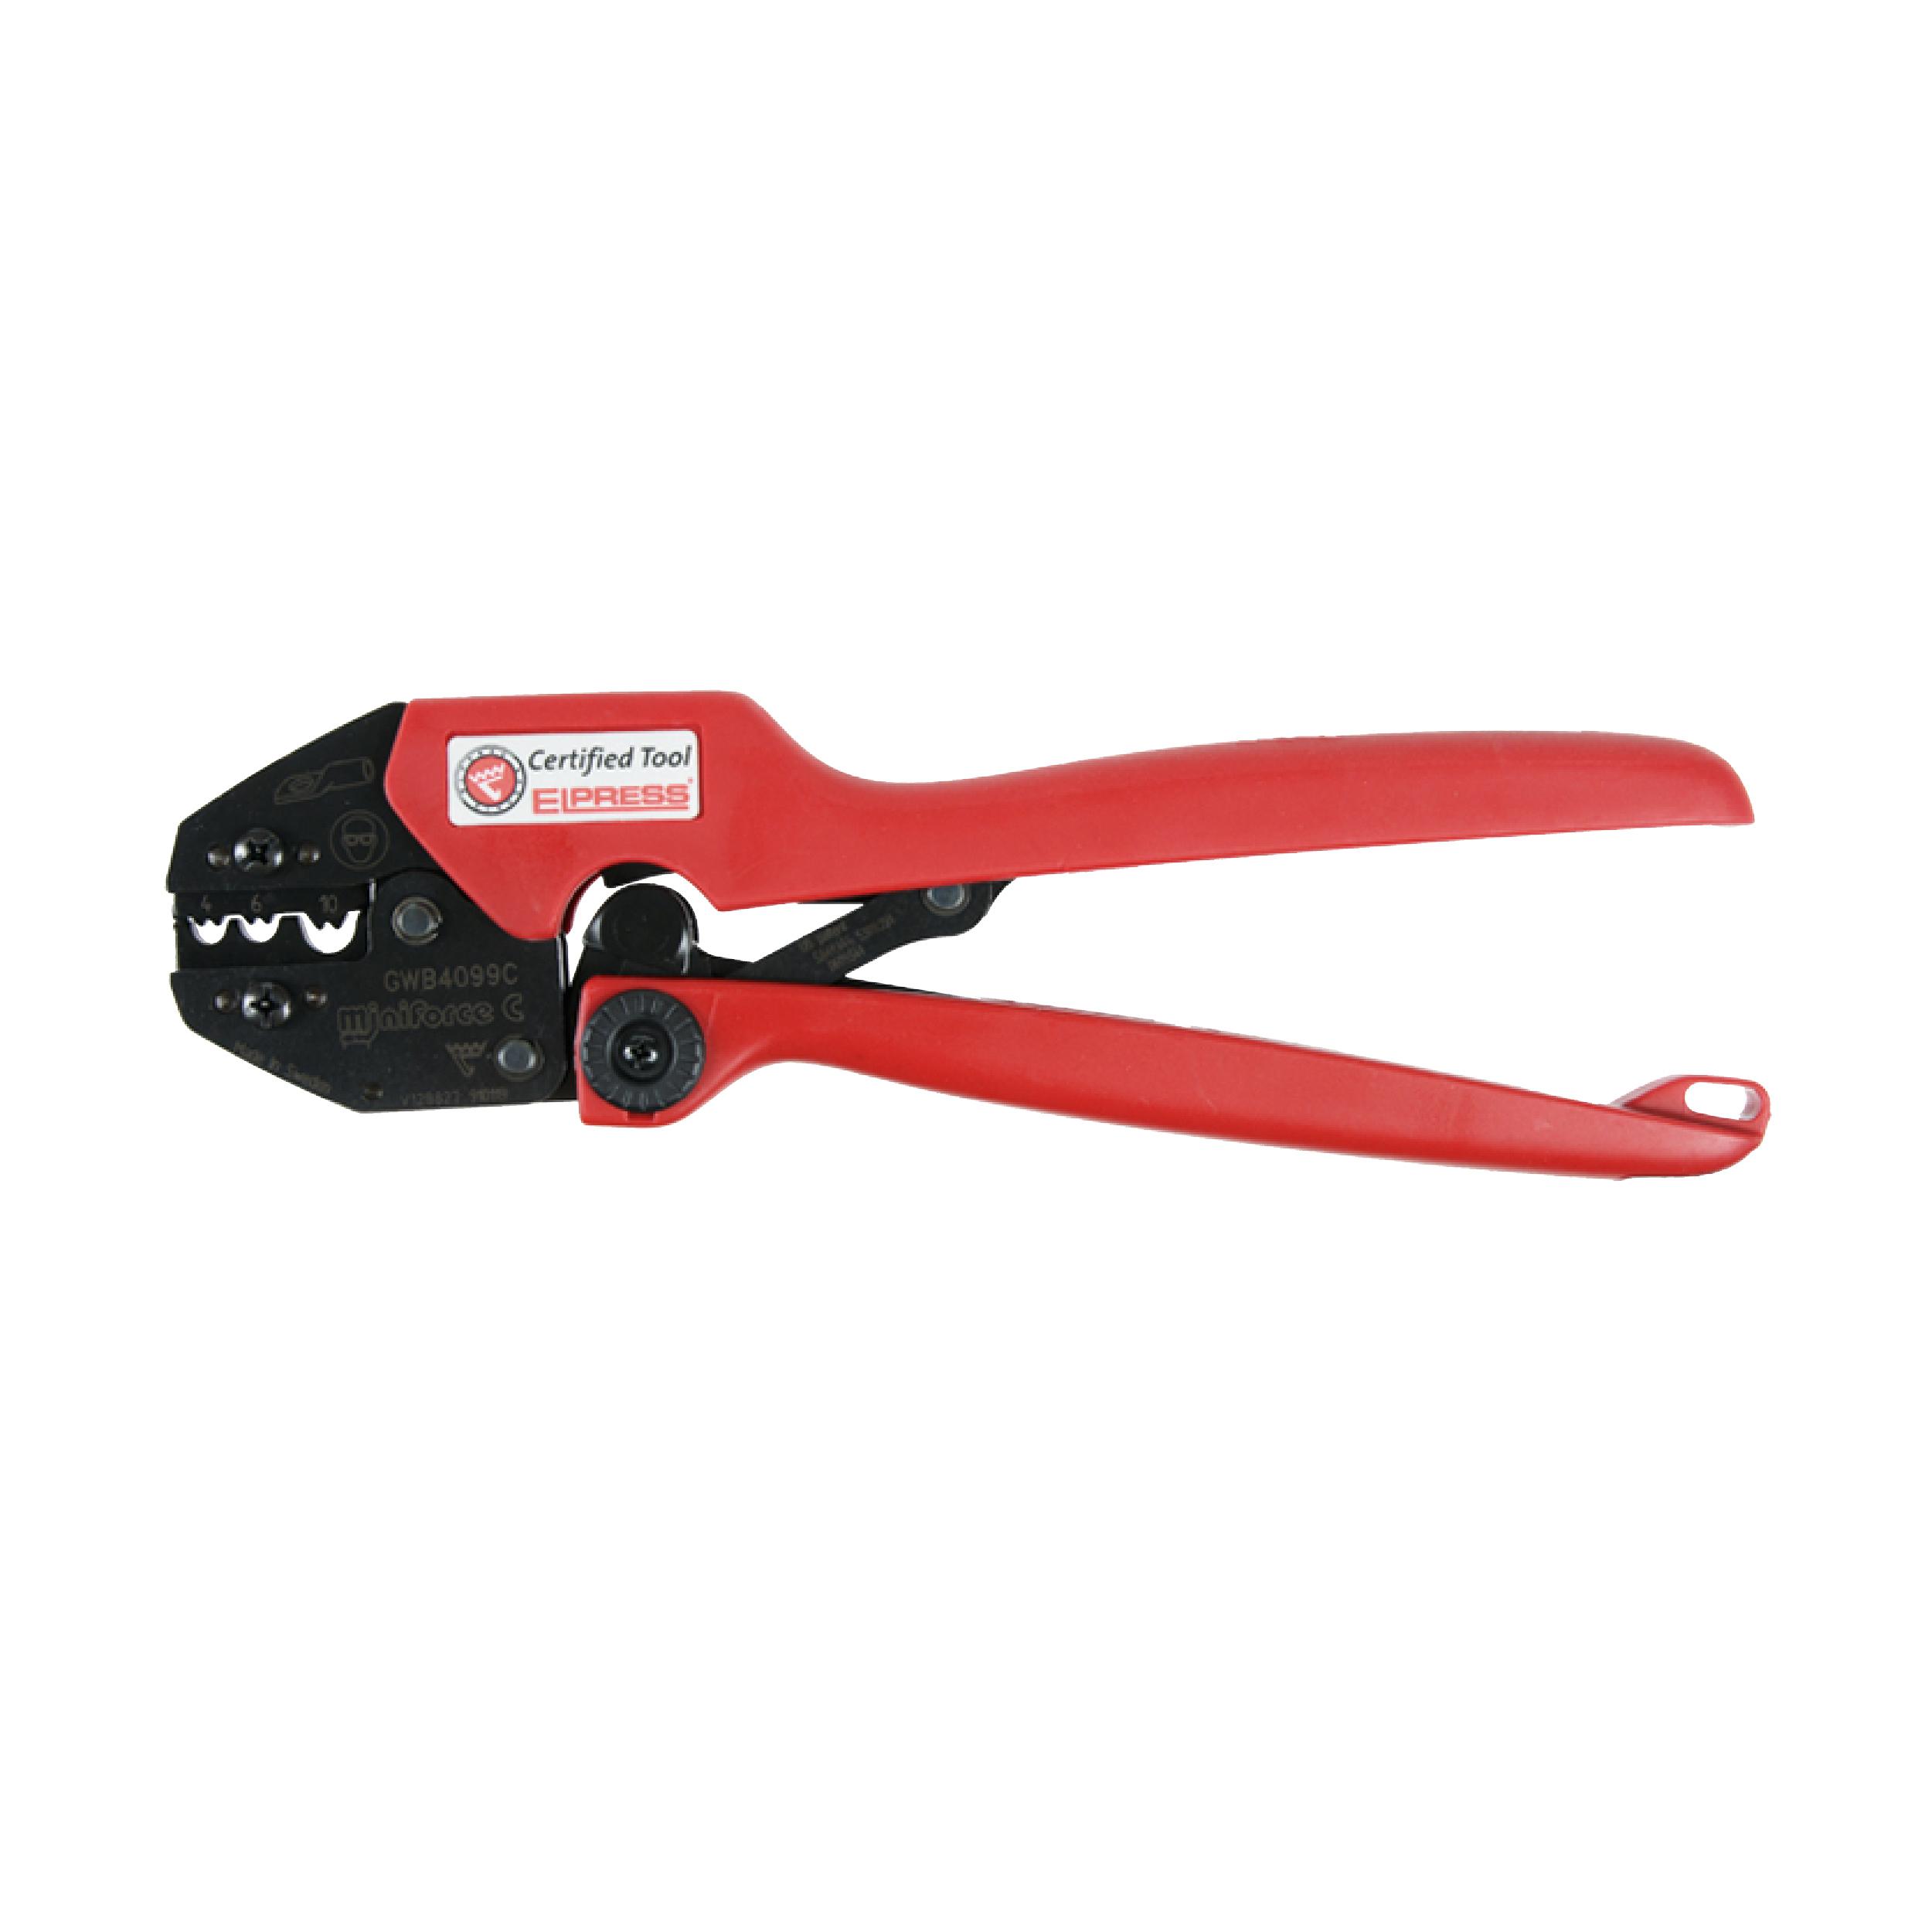 Elpress GWB4099C Miniforce Crimping Tool (4-10mm²)